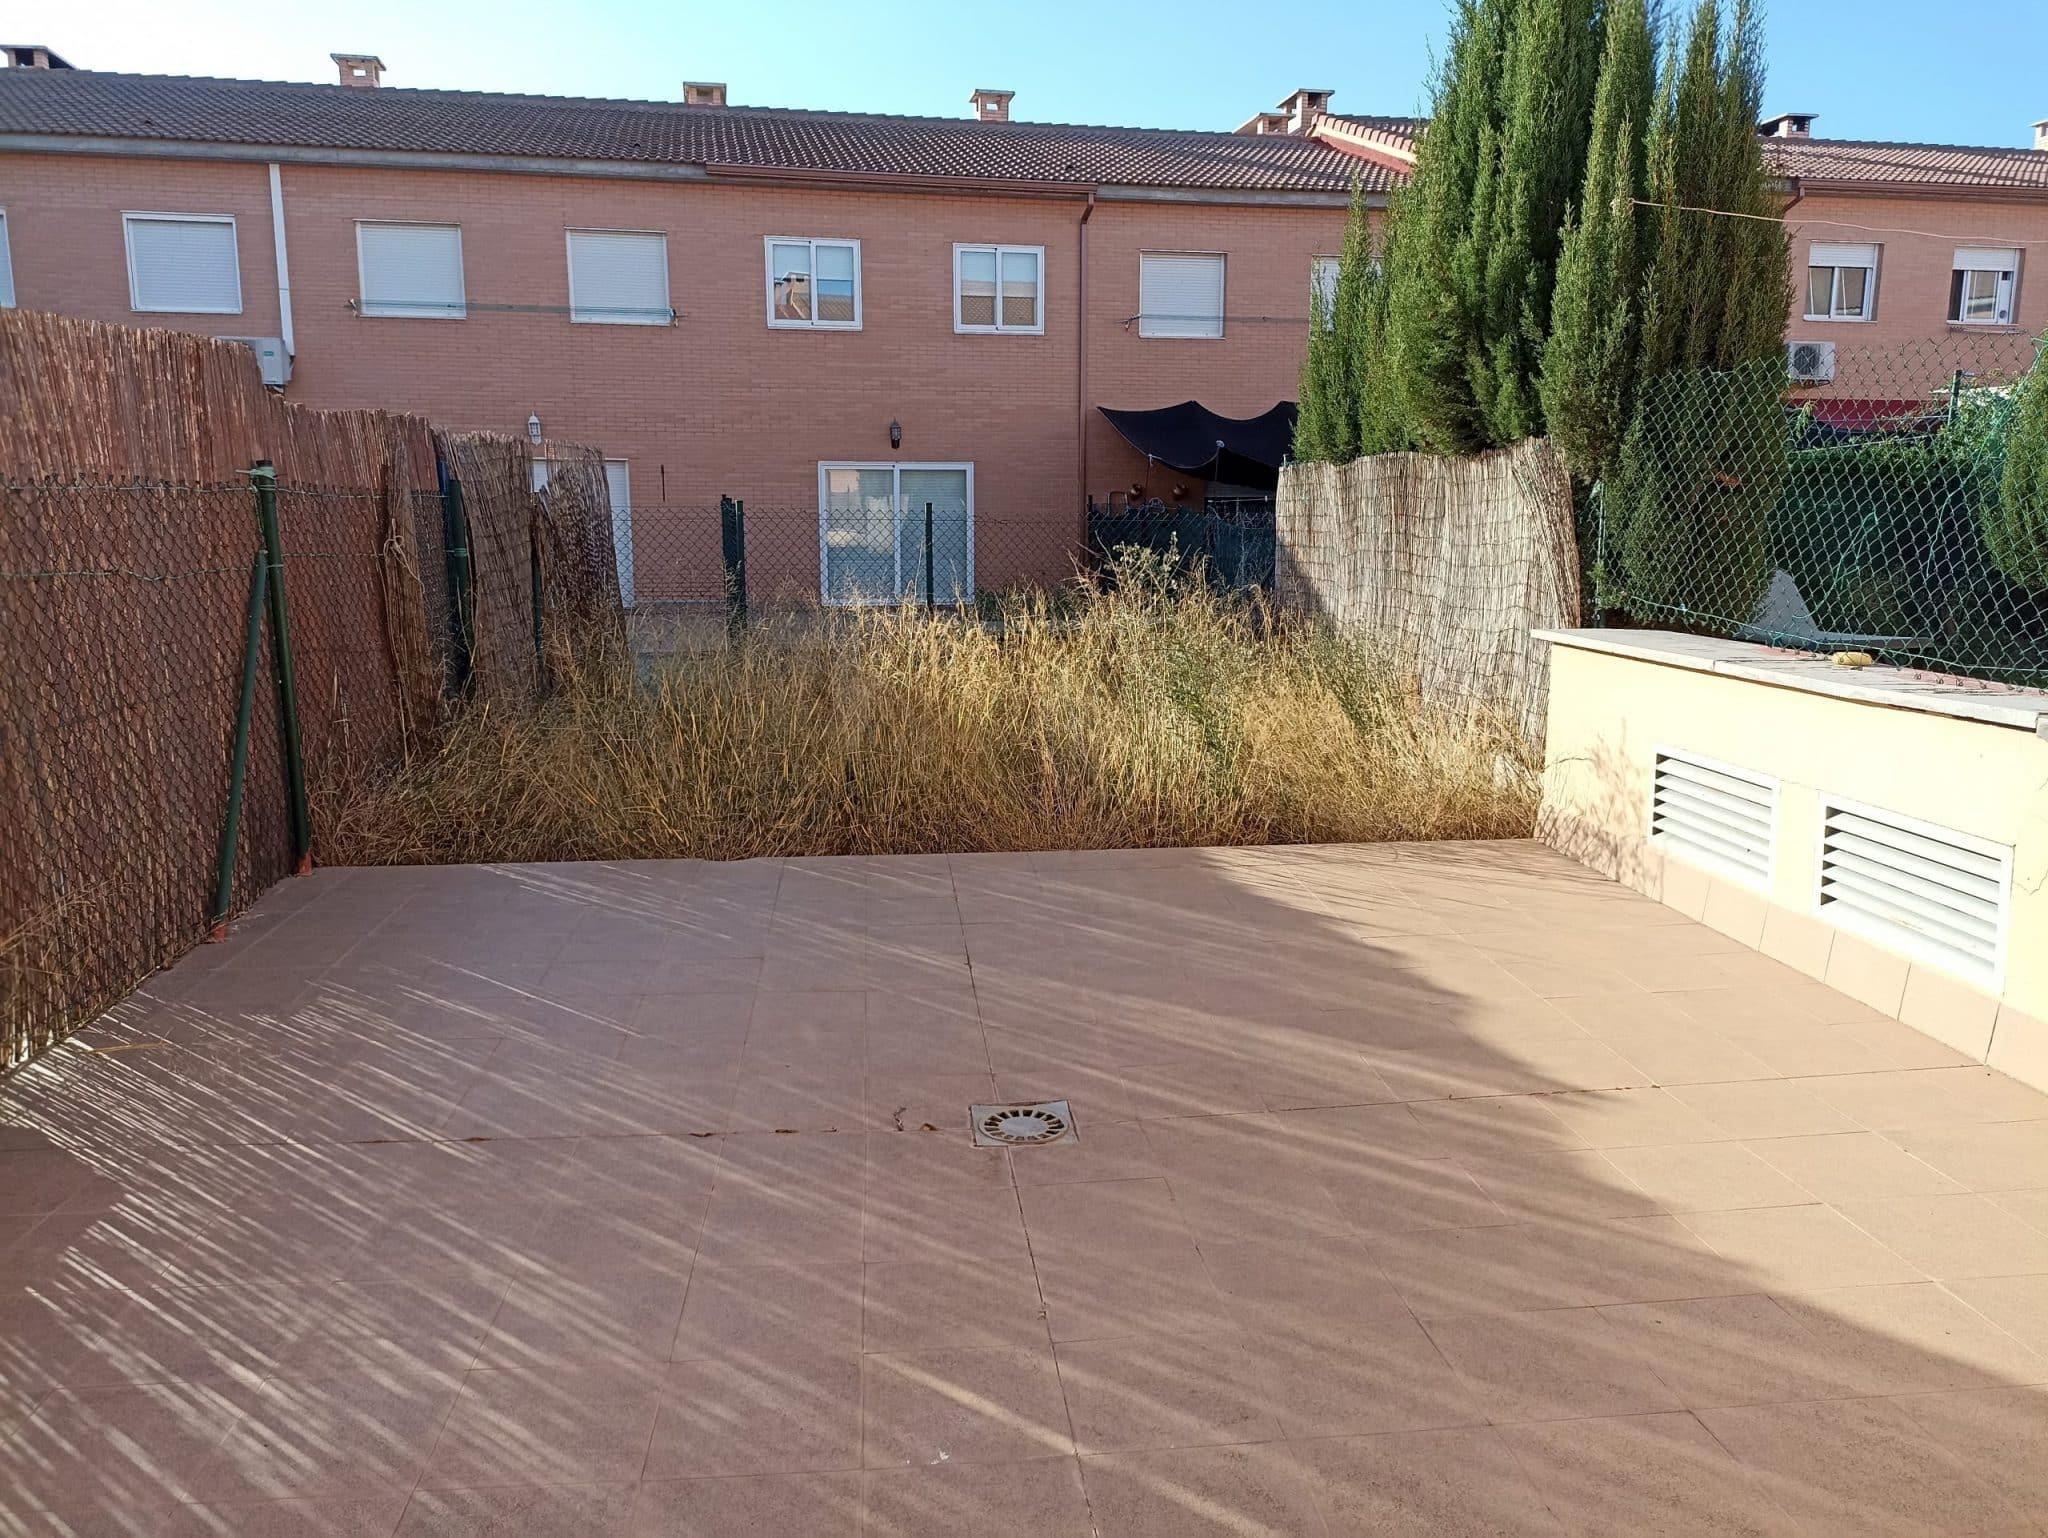 Unifamiliar en venta en Osera de Ebro (Zaragoza)